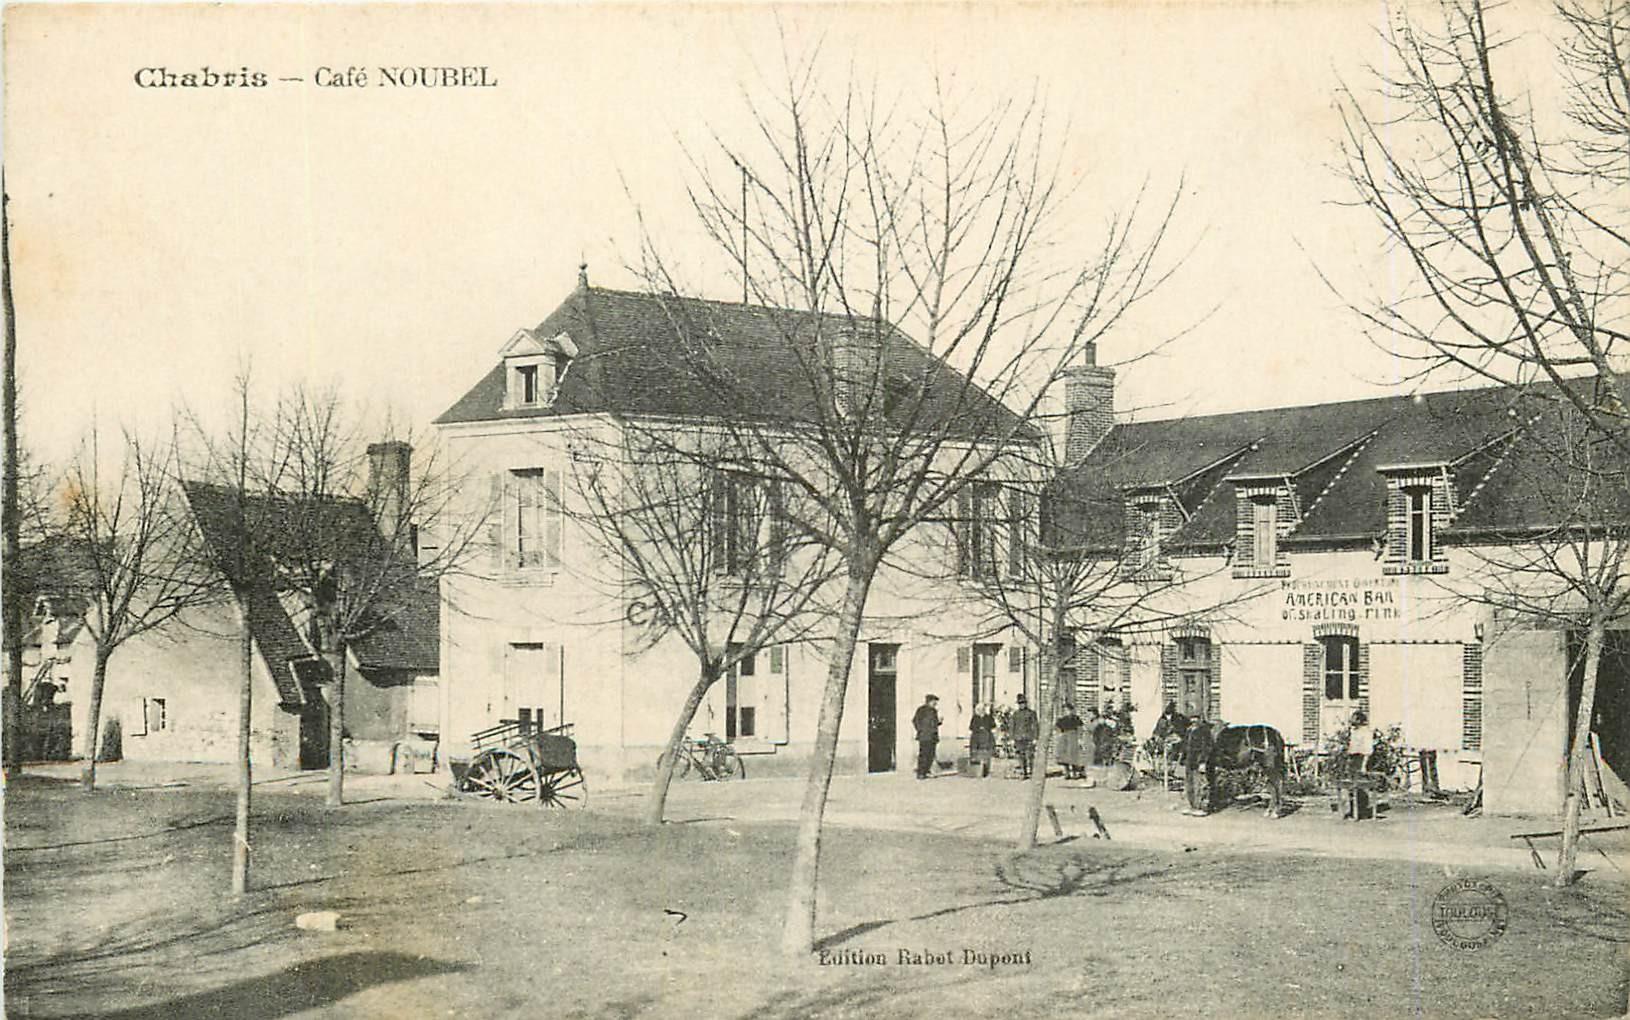 WW 36 CHABRIS. Café Noubel American Bar